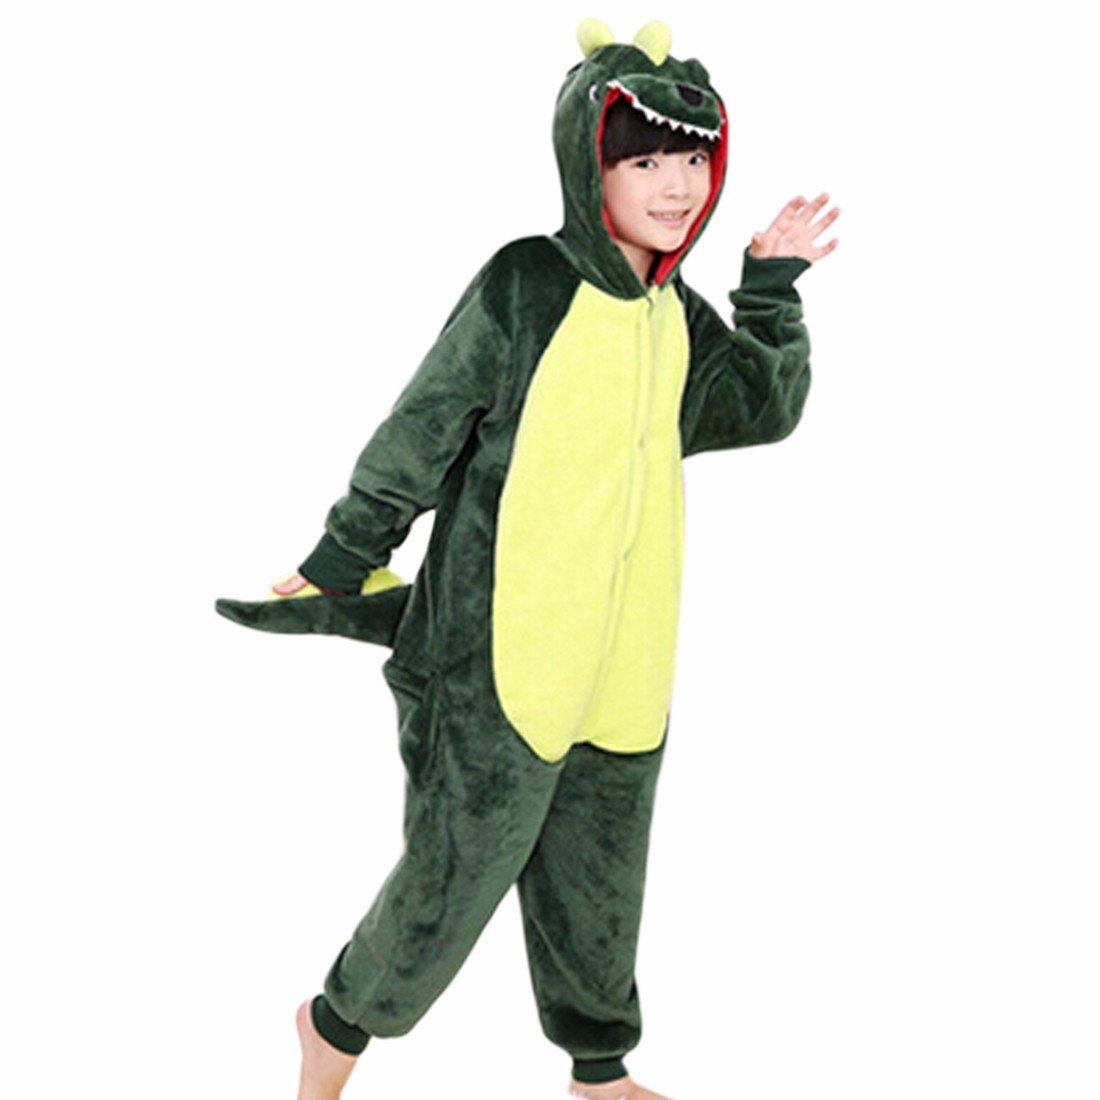 Kids child Cute Cartoon Animal Flannel Pajamas Cosplay Sleepwear Party Costume QIYUN.Z 3030S-SUM2/1ONE